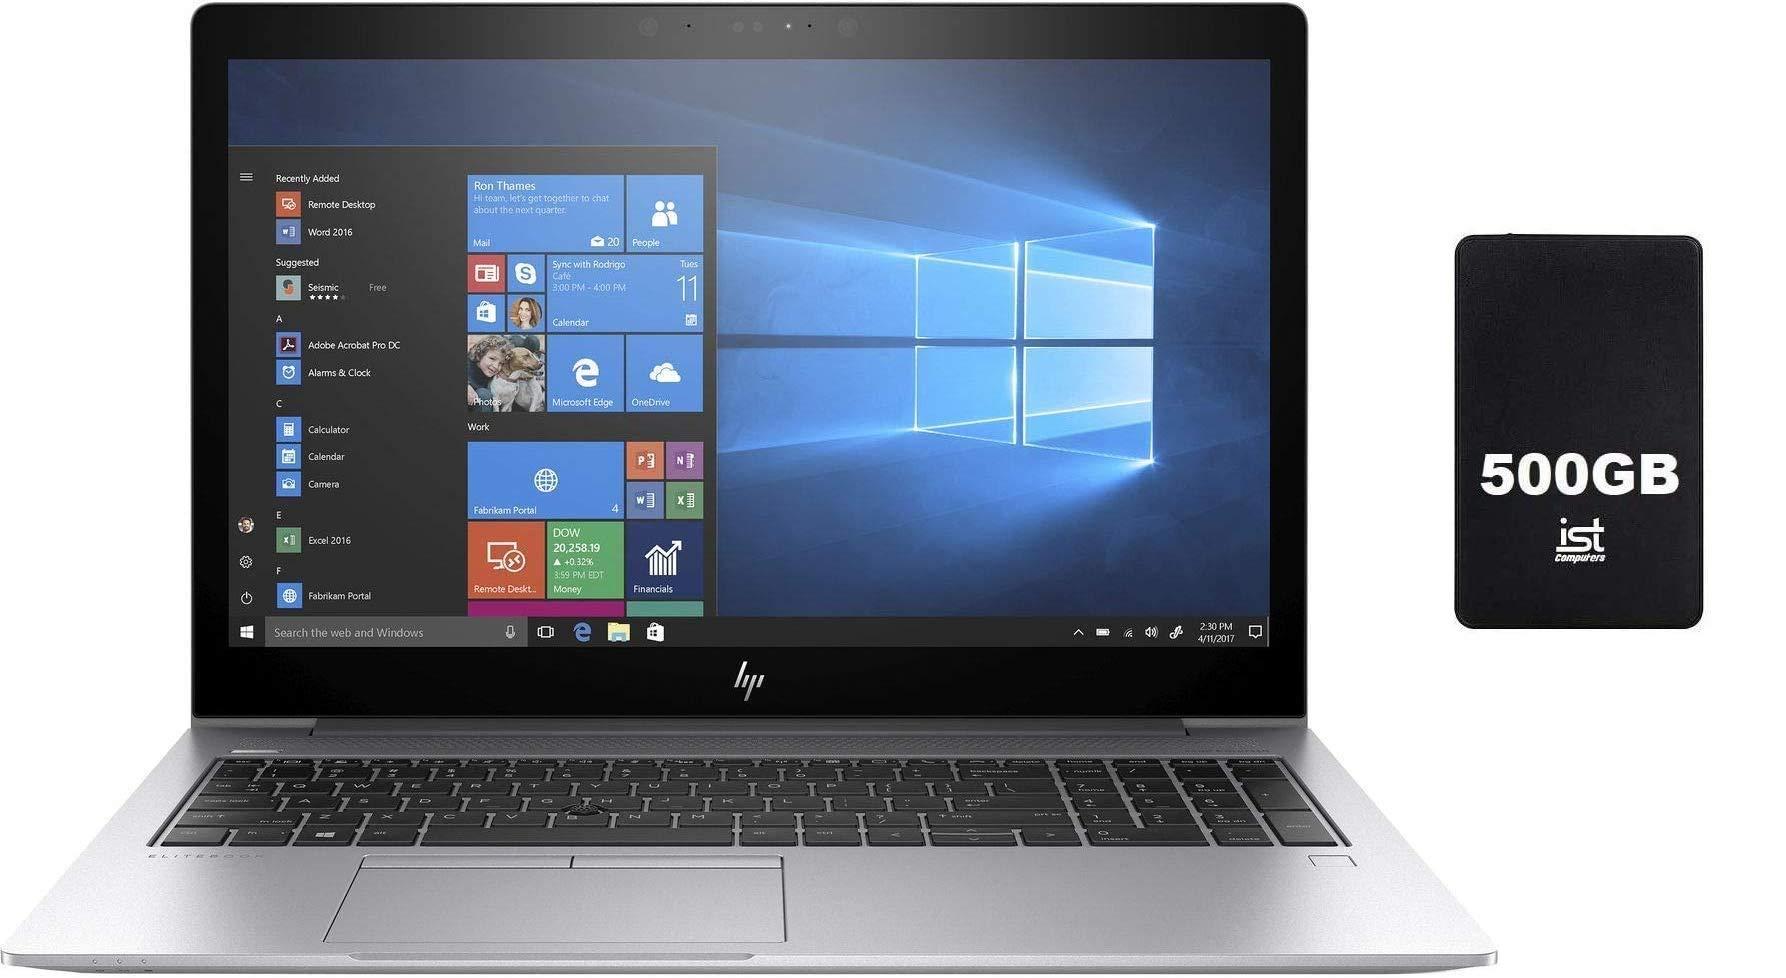 "2019 HP Elitebook 850 G5 15.6"" Full HD FHD Business Laptop (Intel Quad-Core i5-8250U, 16GB DDR4 RAM, 512GB PCIe NVMe M.2 SSD) Fingerprint, Backlit, Thunderbolt, HDMI, Windows 10 Pro+IST 500GB"